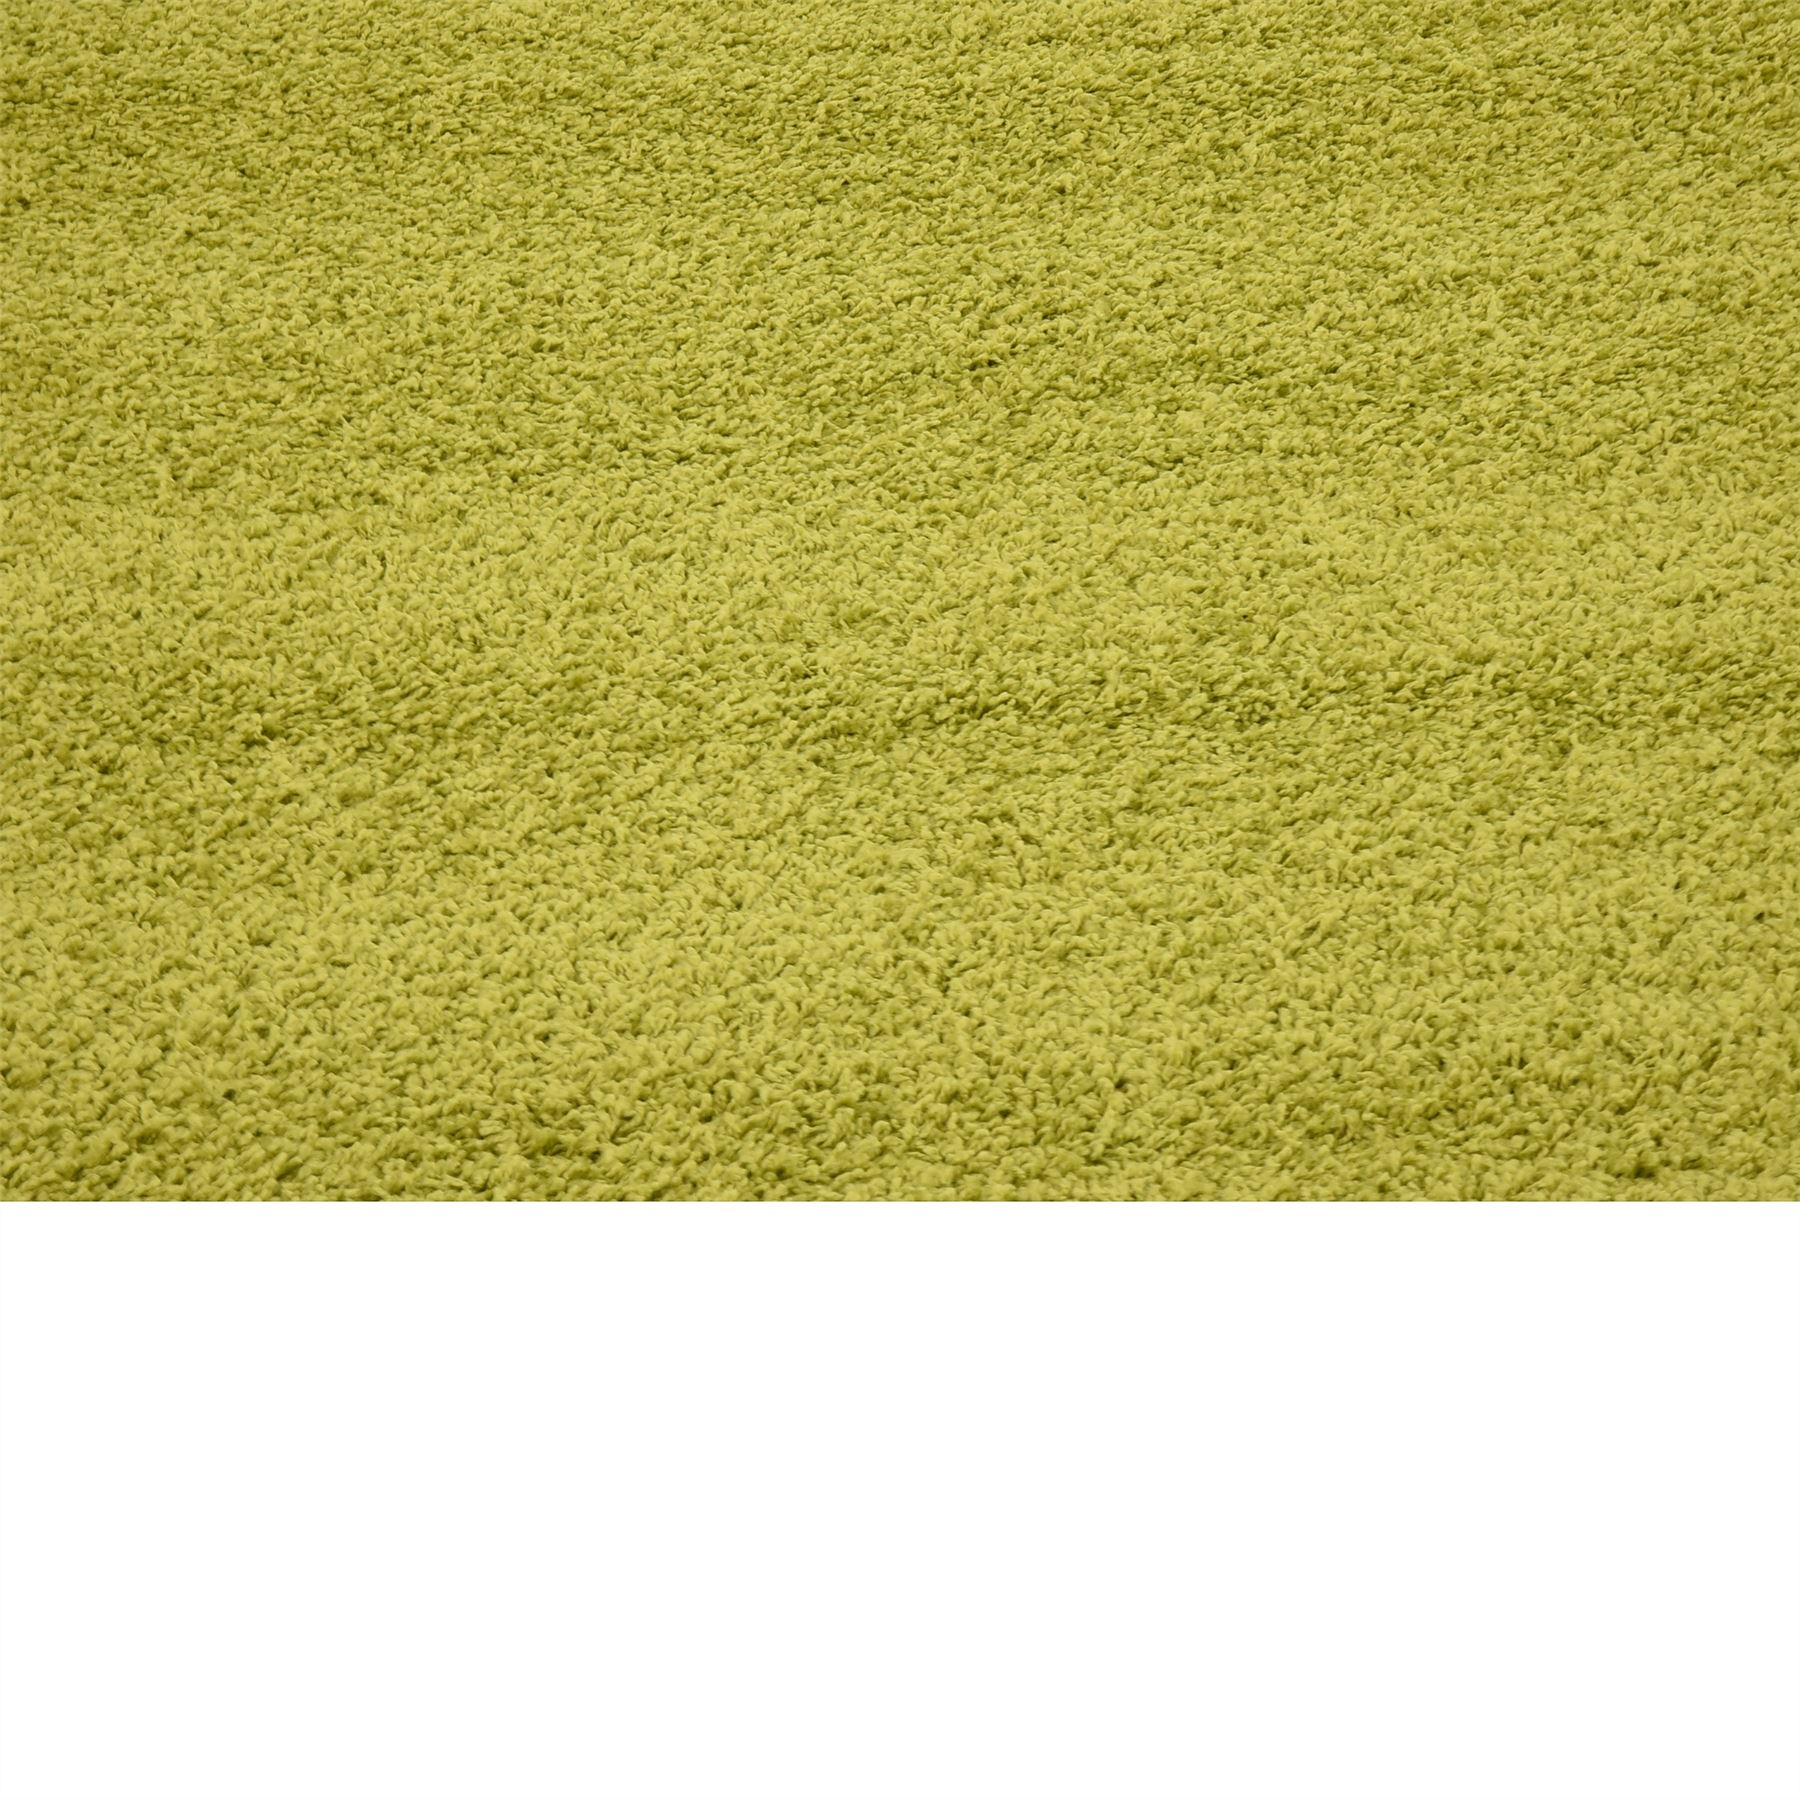 Soft Shaggy Rugs Thick Pile Carpet 9 0 X 12 0 Moss Green